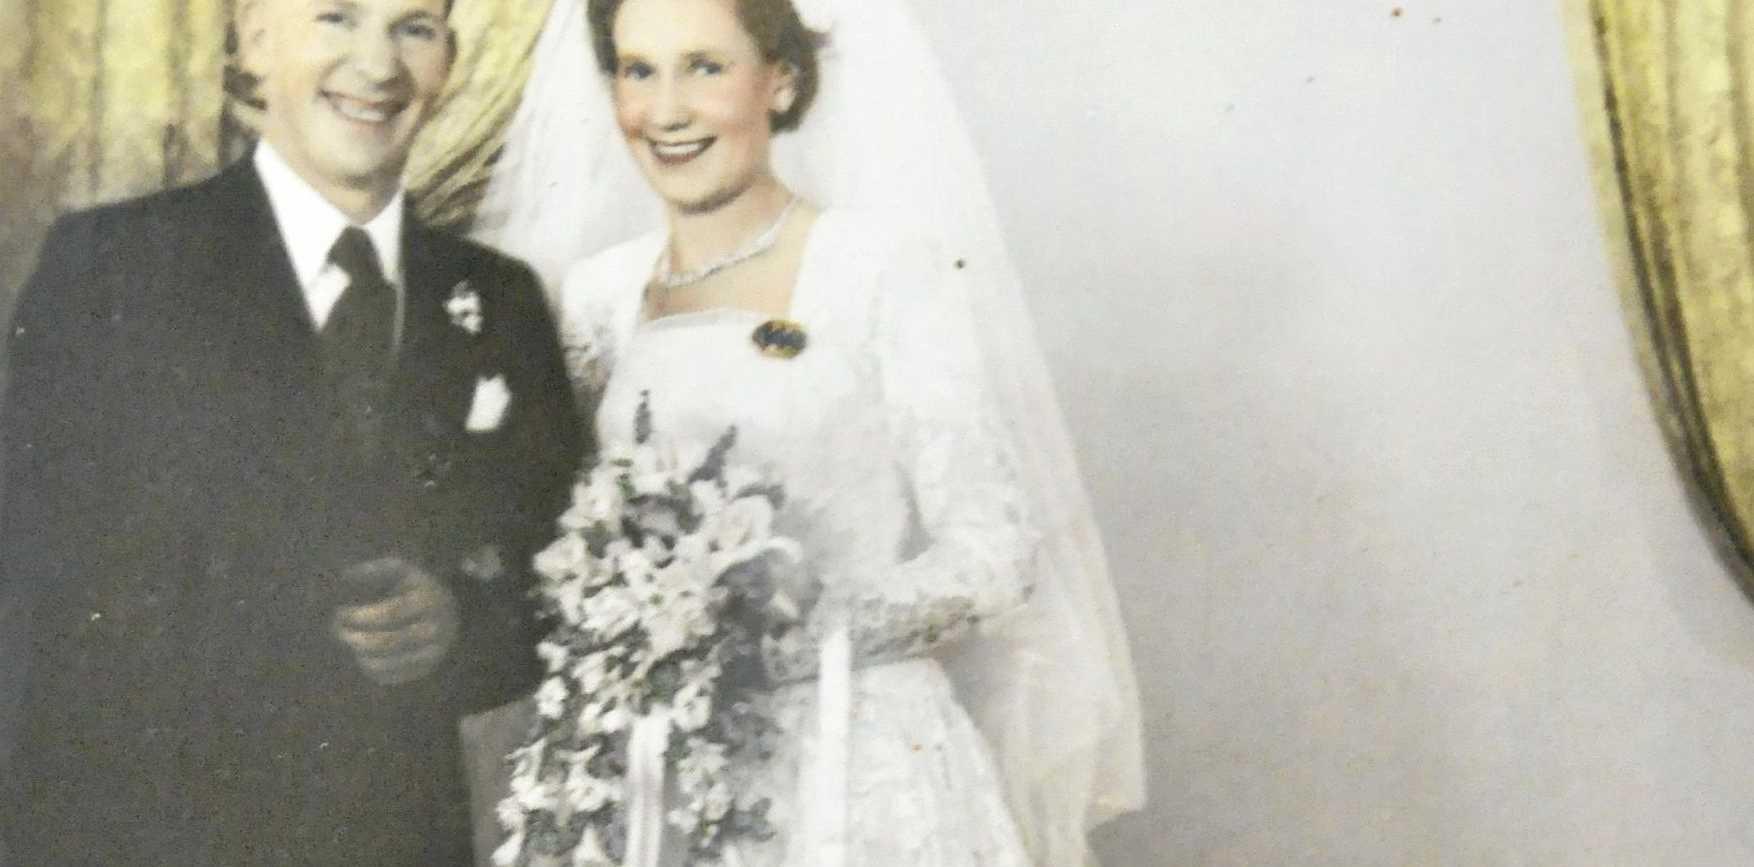 WEDDING BELLS: Bill and Joan Dabinett were married in Toowoomba on October 20, 1956.